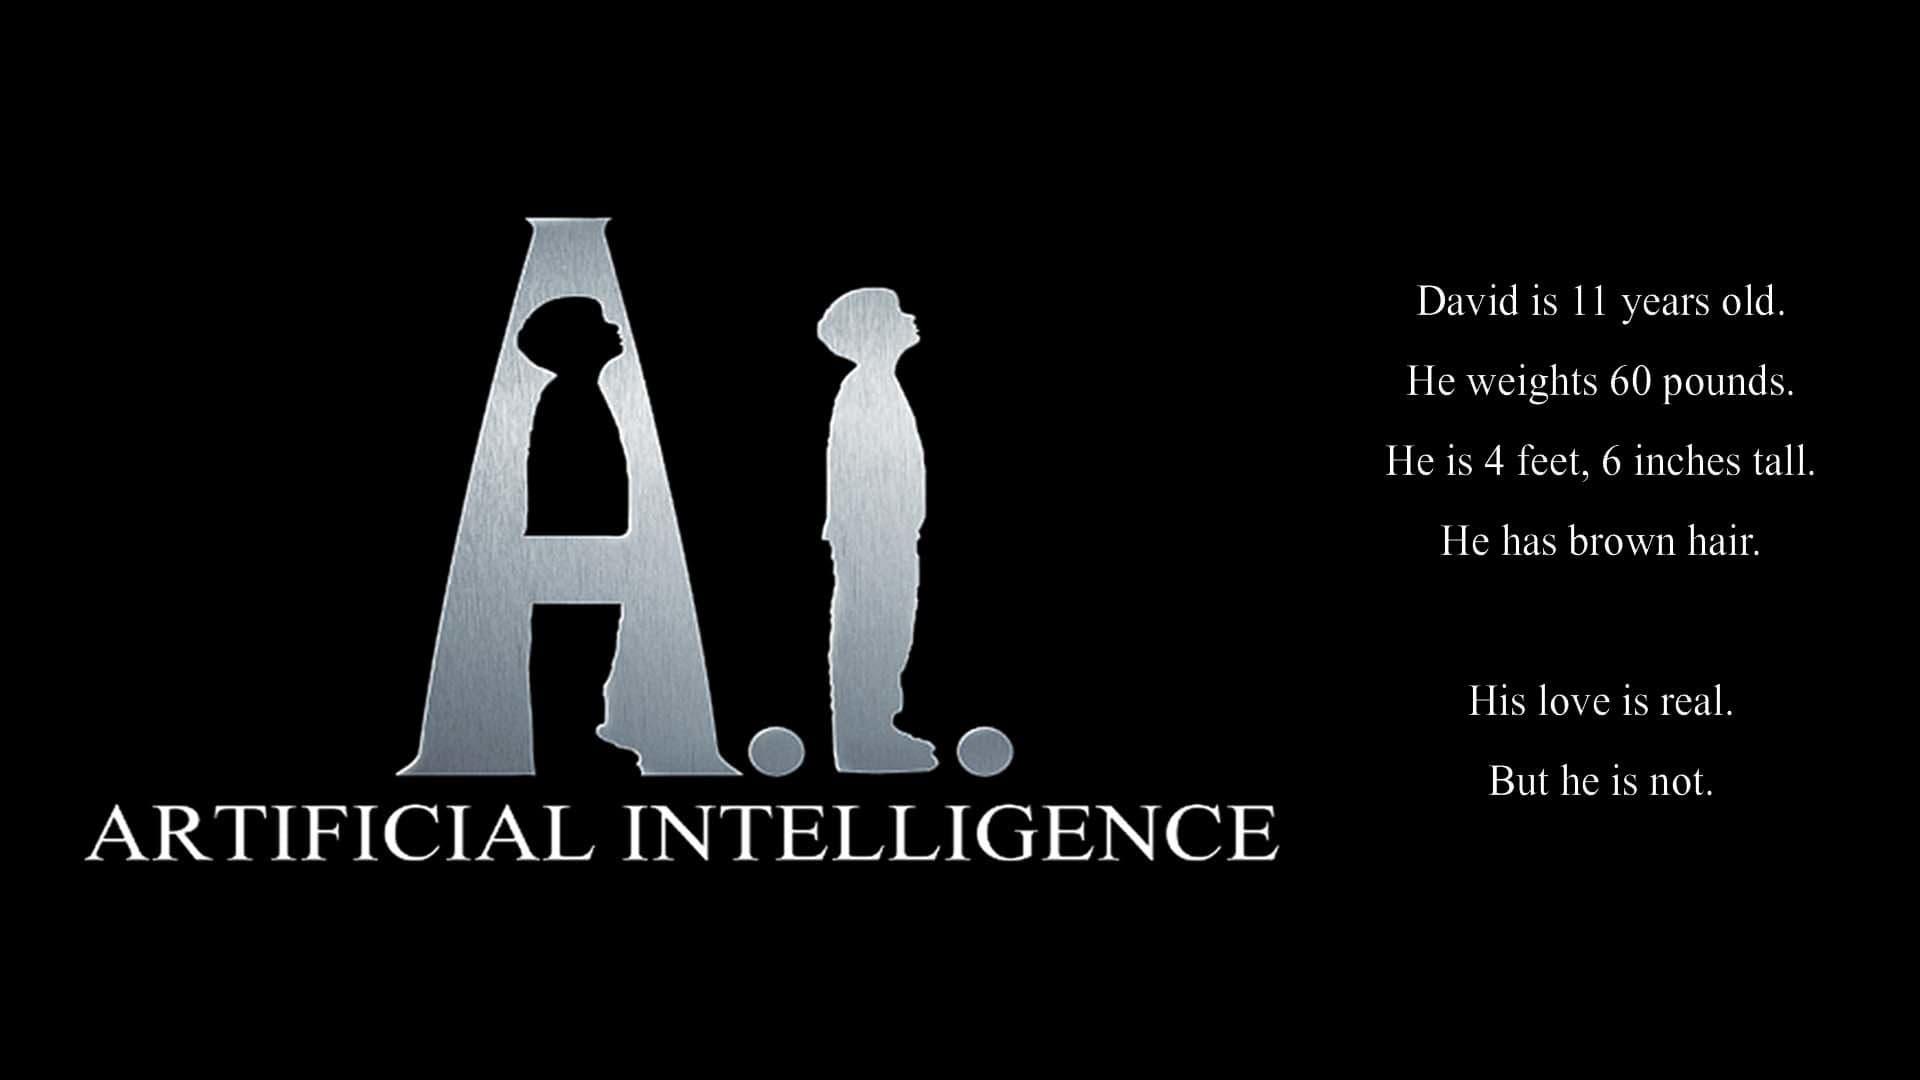 ai artificial intelligence 2001 az movies